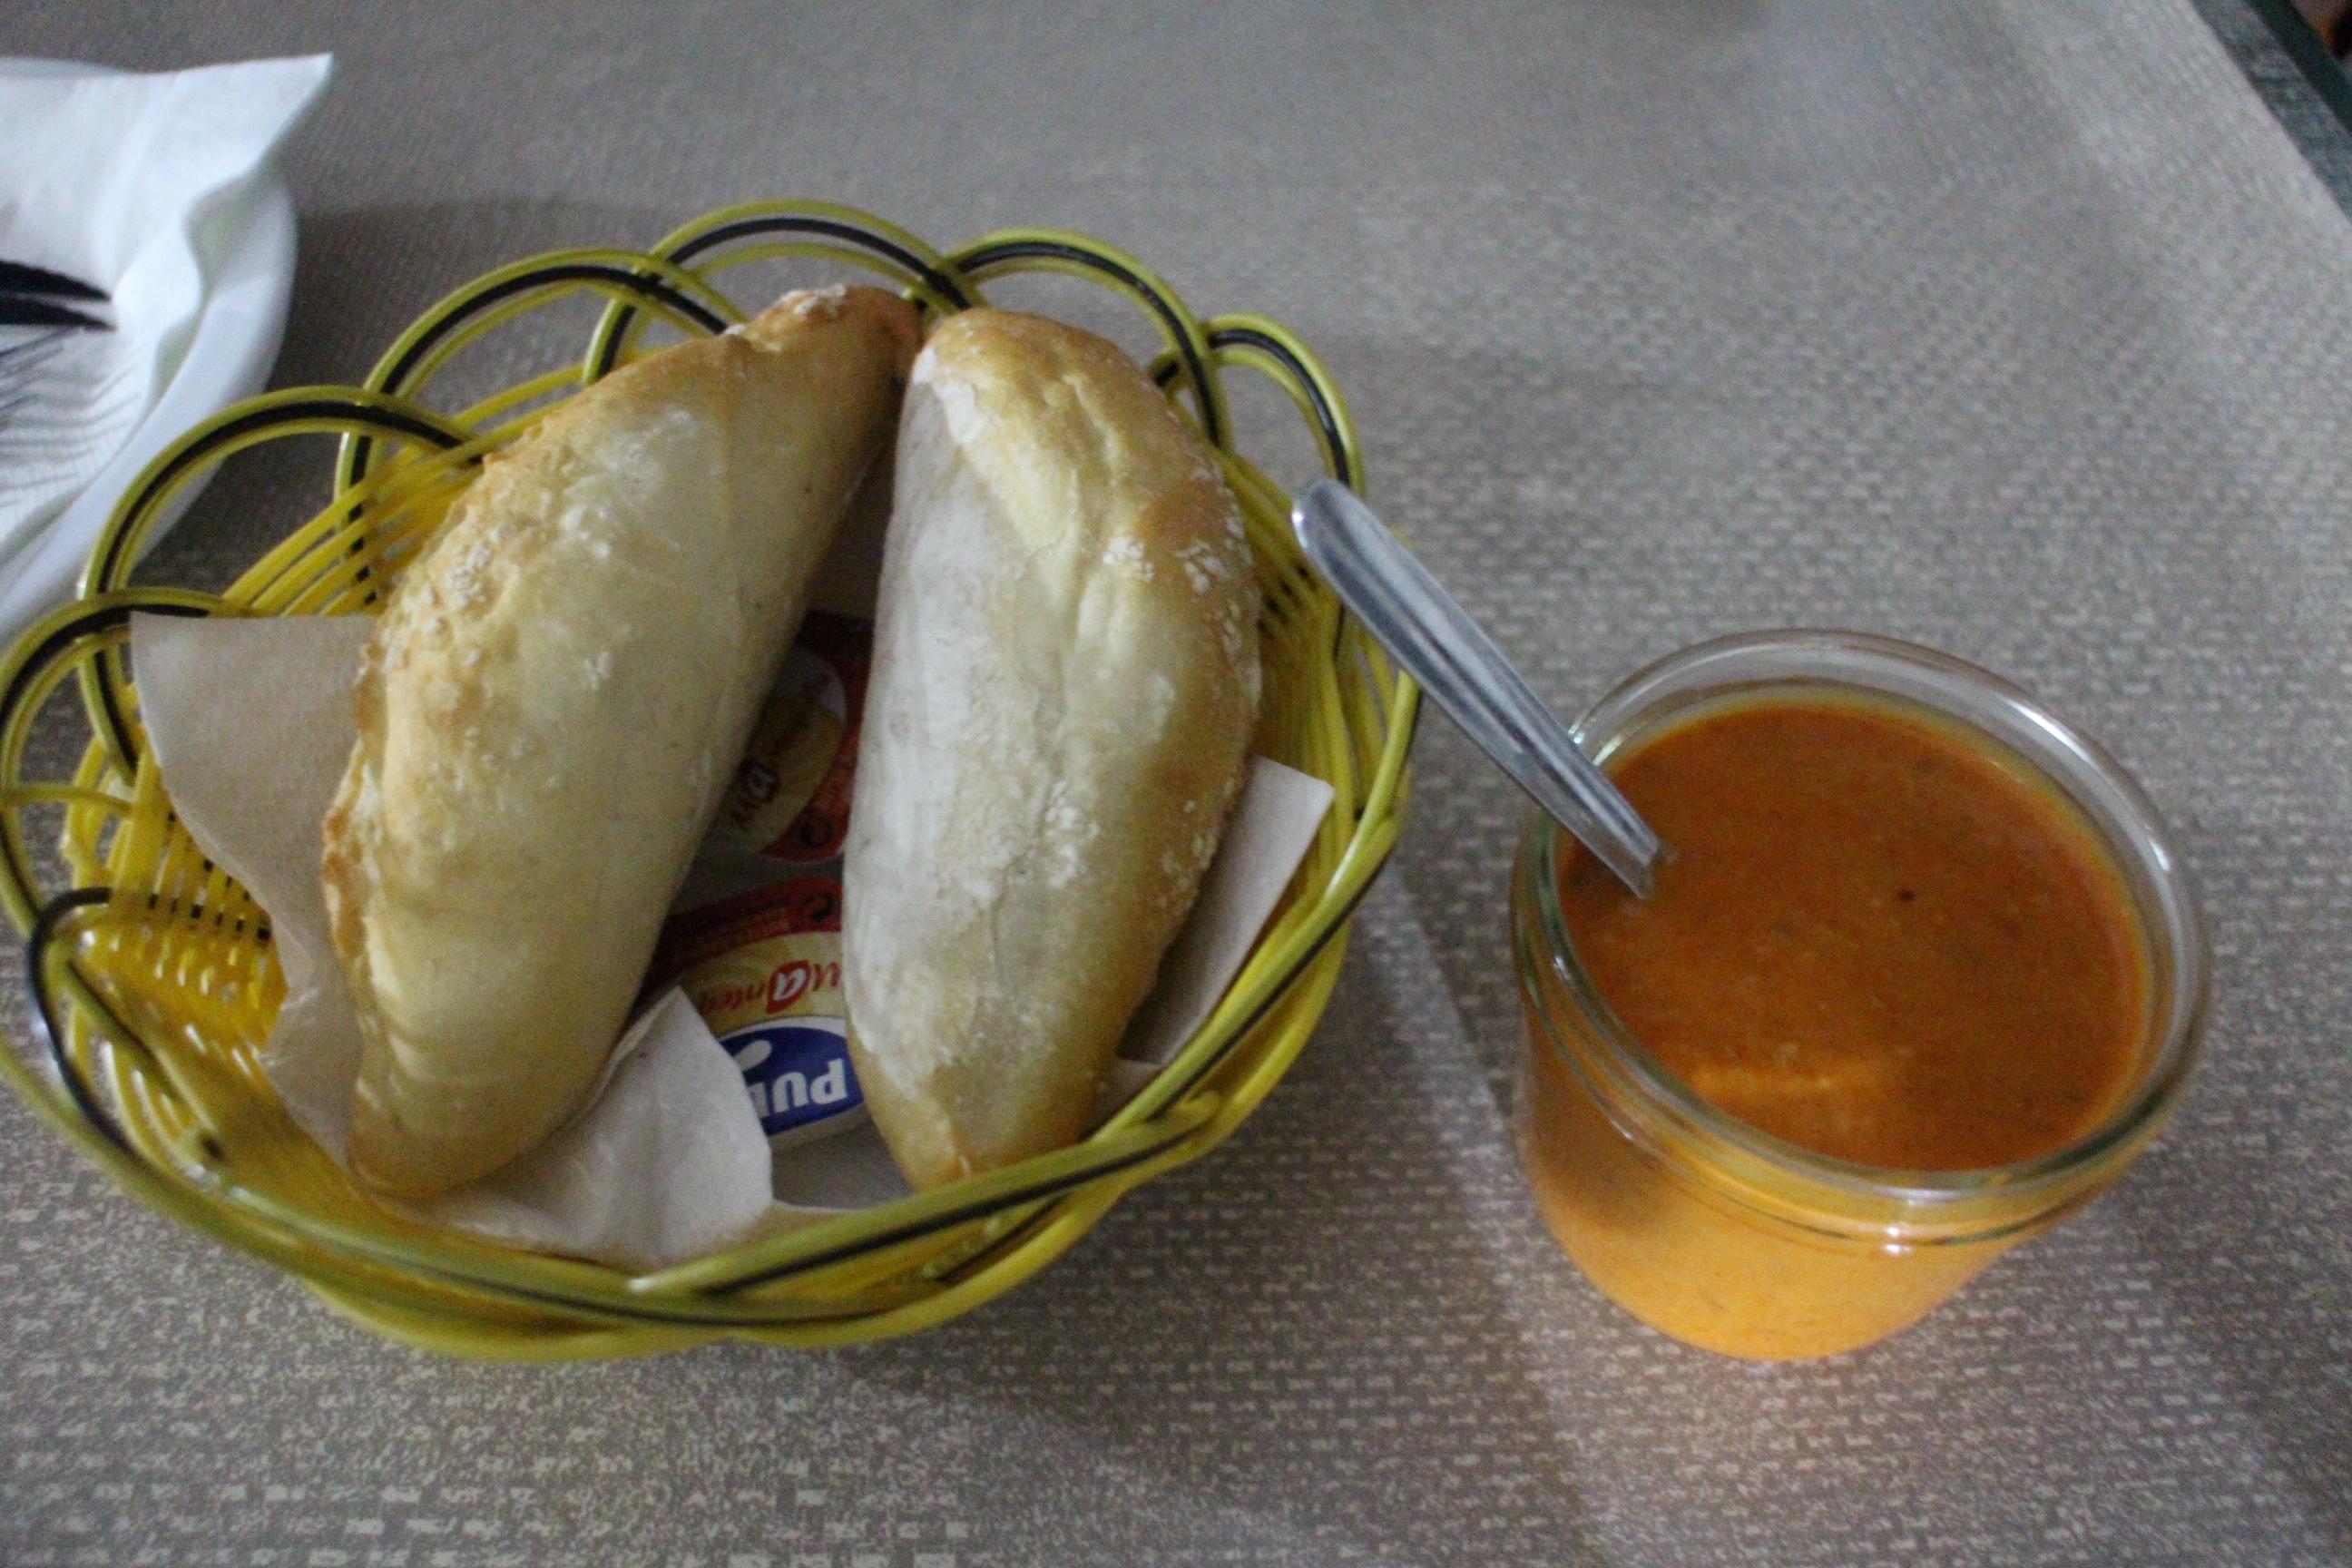 Otelo的mojo沾醬,配麵包就好好吃!